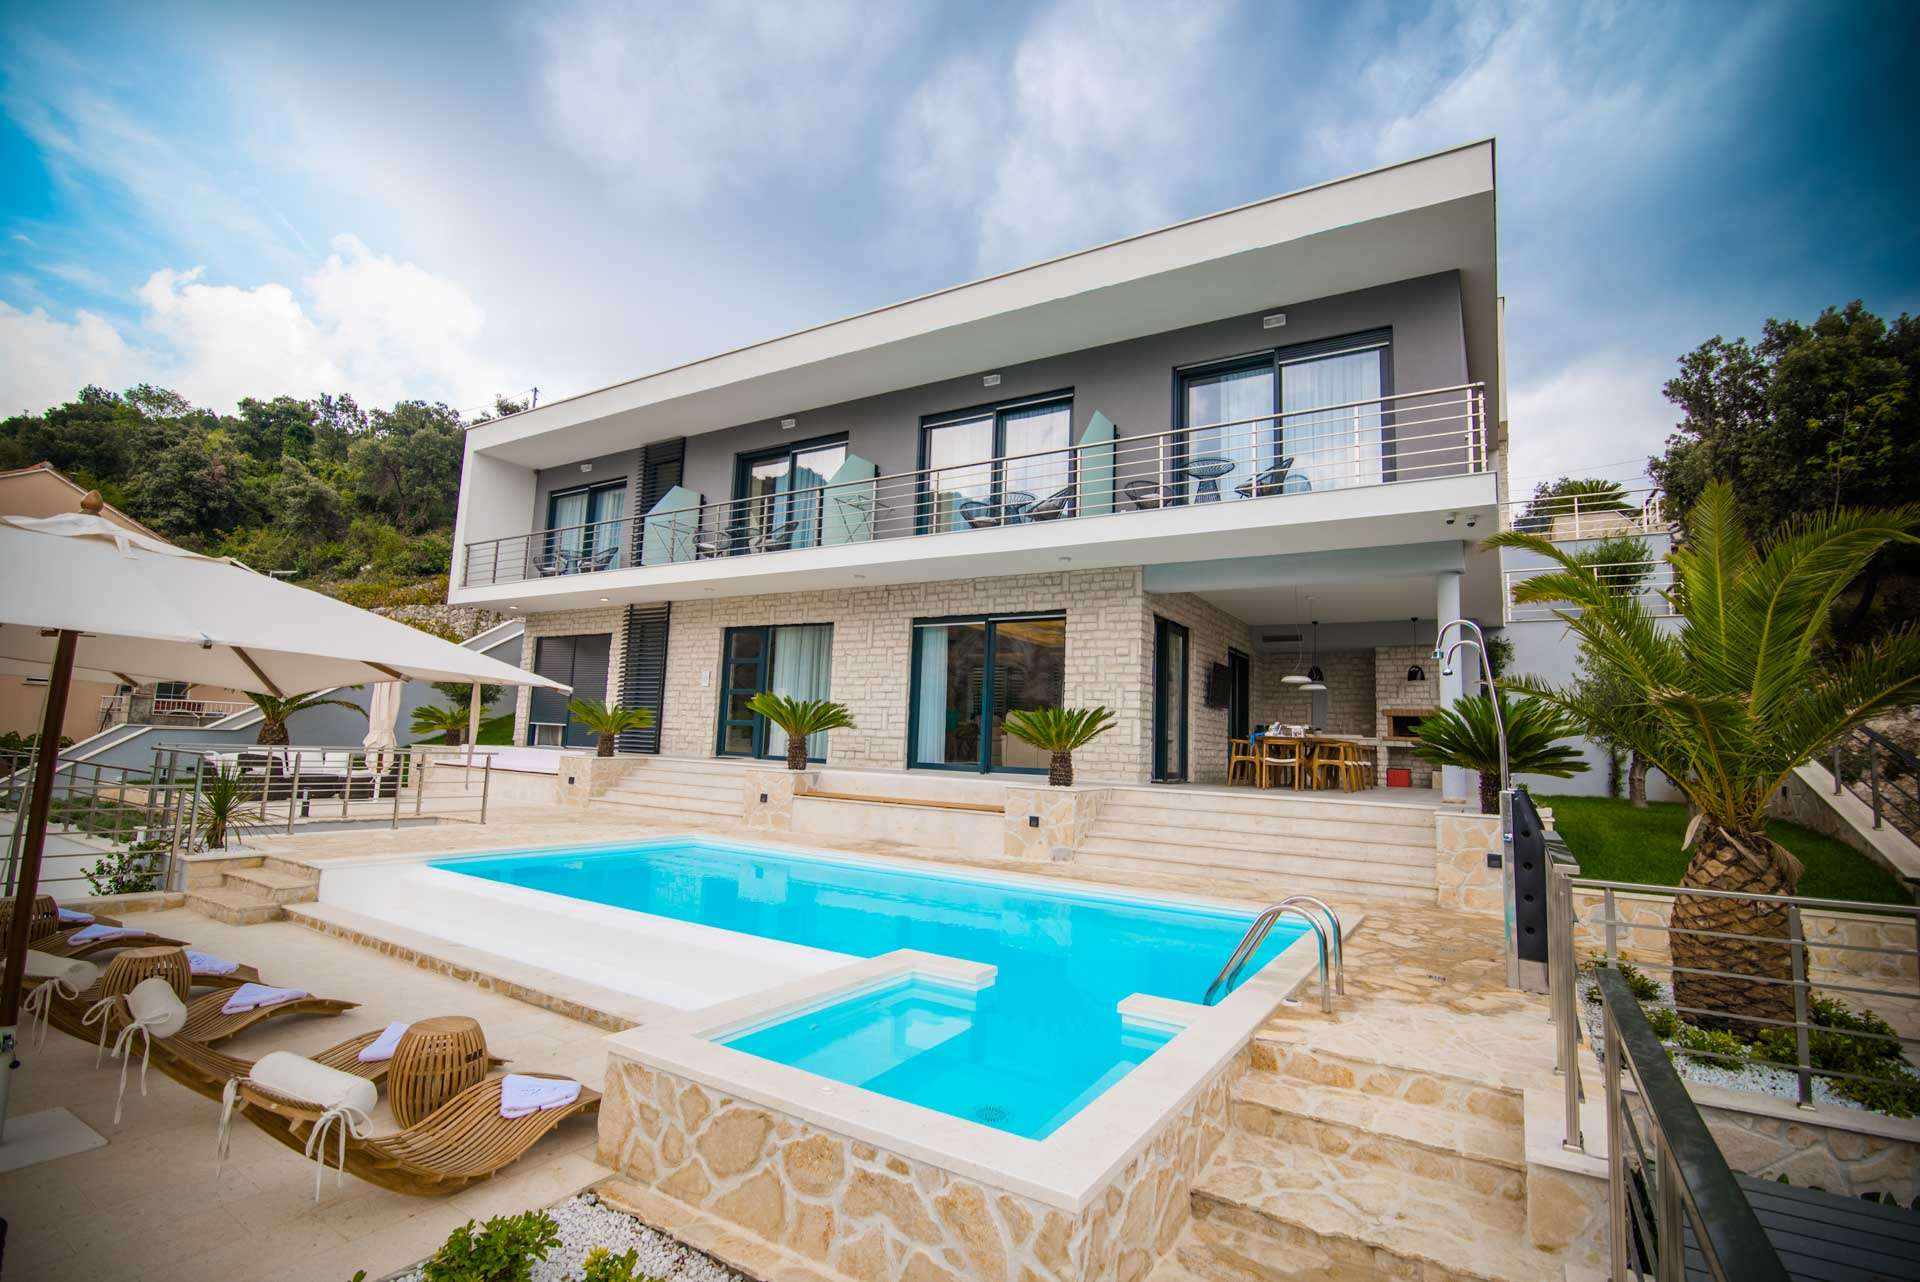 Luxury vacation rentals europe - Croatia - Dalmatia - Dubrovnik - Dubrovnik Earth - Image 1/39